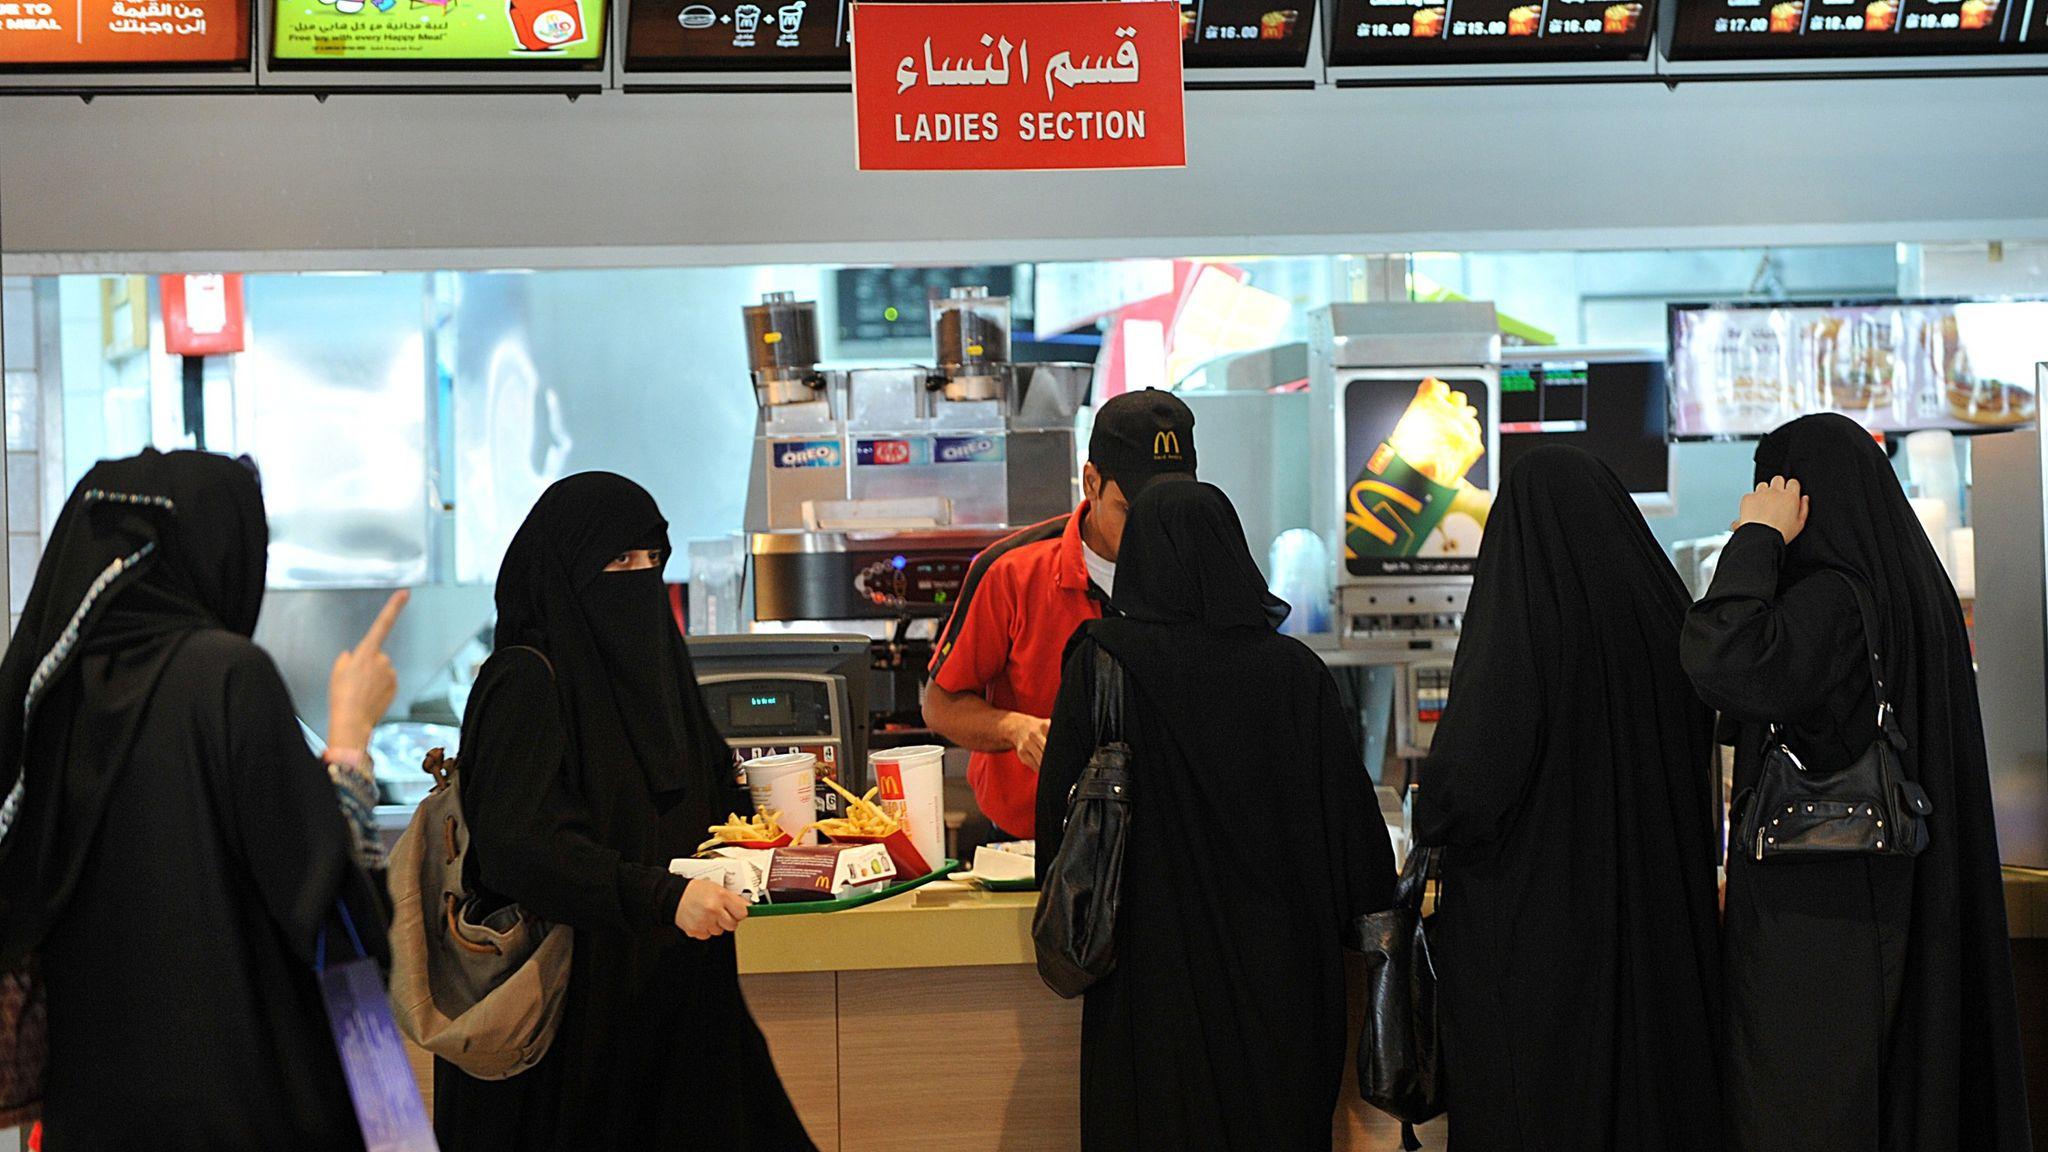 Saudi Arabia lifts ban on segregating women and men in restaurants